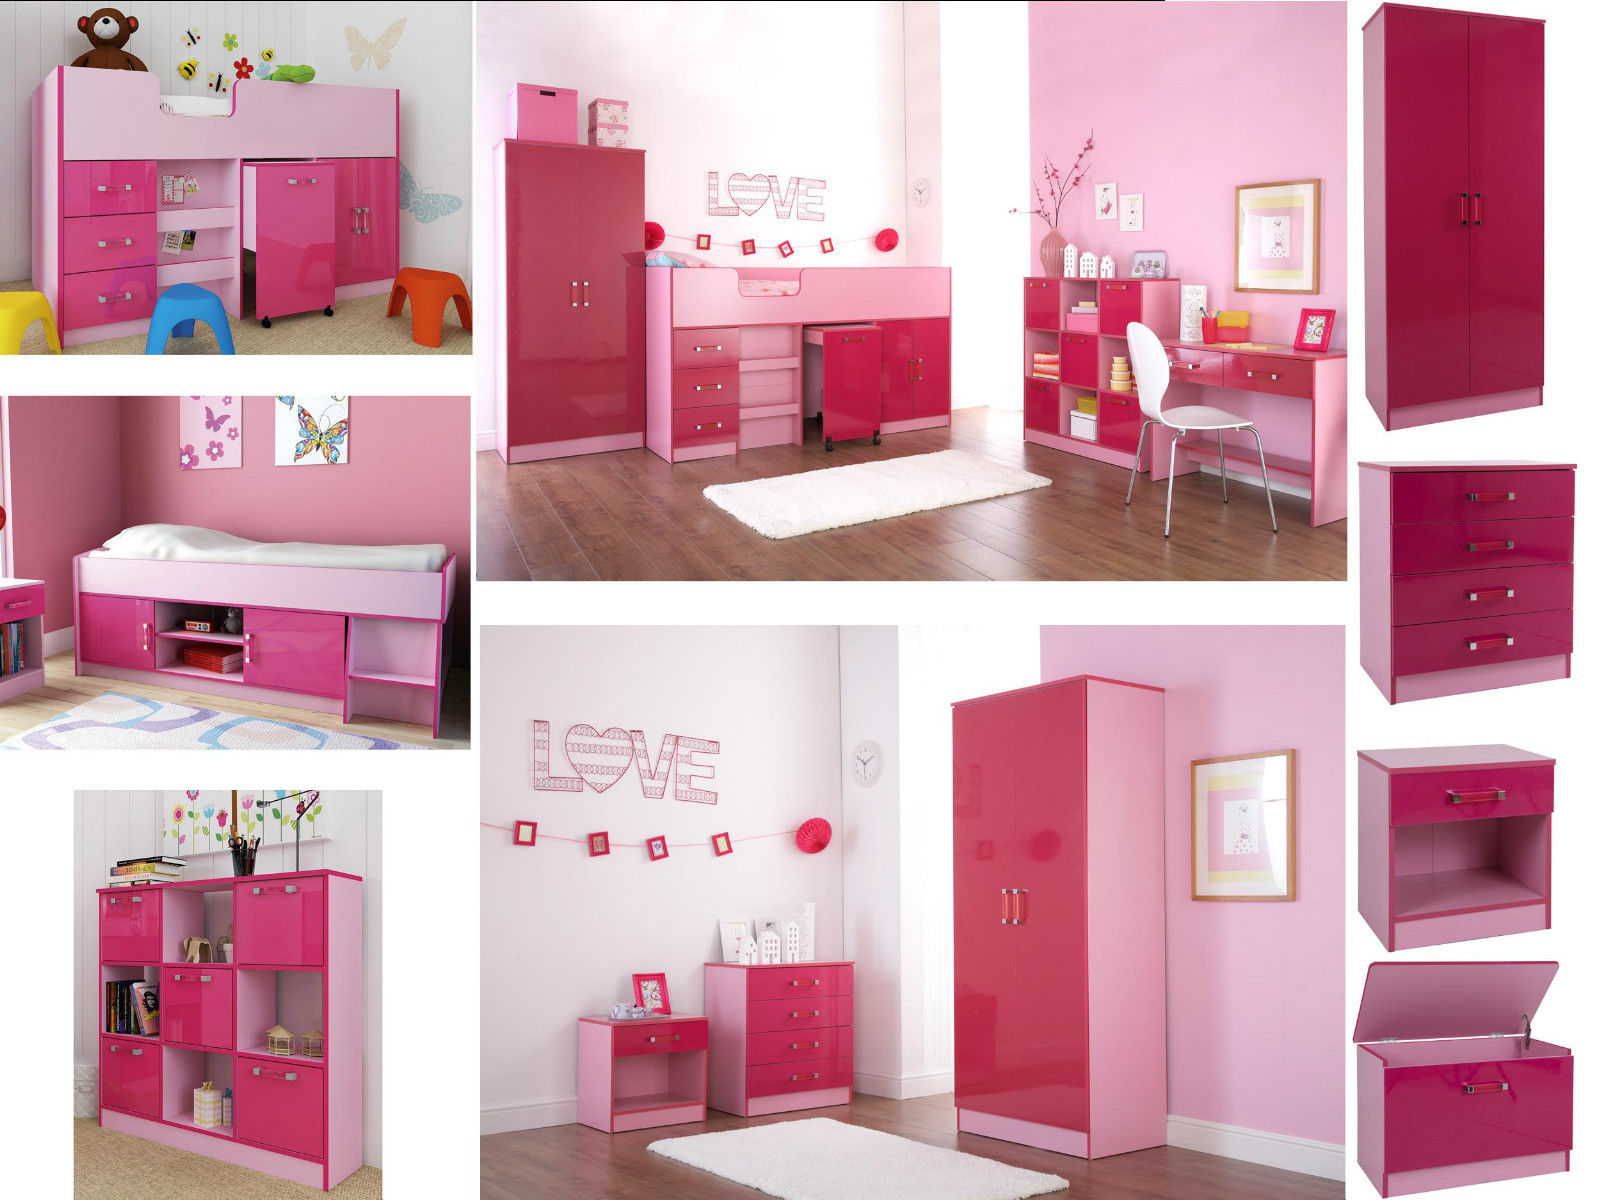 ottawa caspian pink gloss girls bedroom furniture wardrobe drawers beds sets ebay. Black Bedroom Furniture Sets. Home Design Ideas